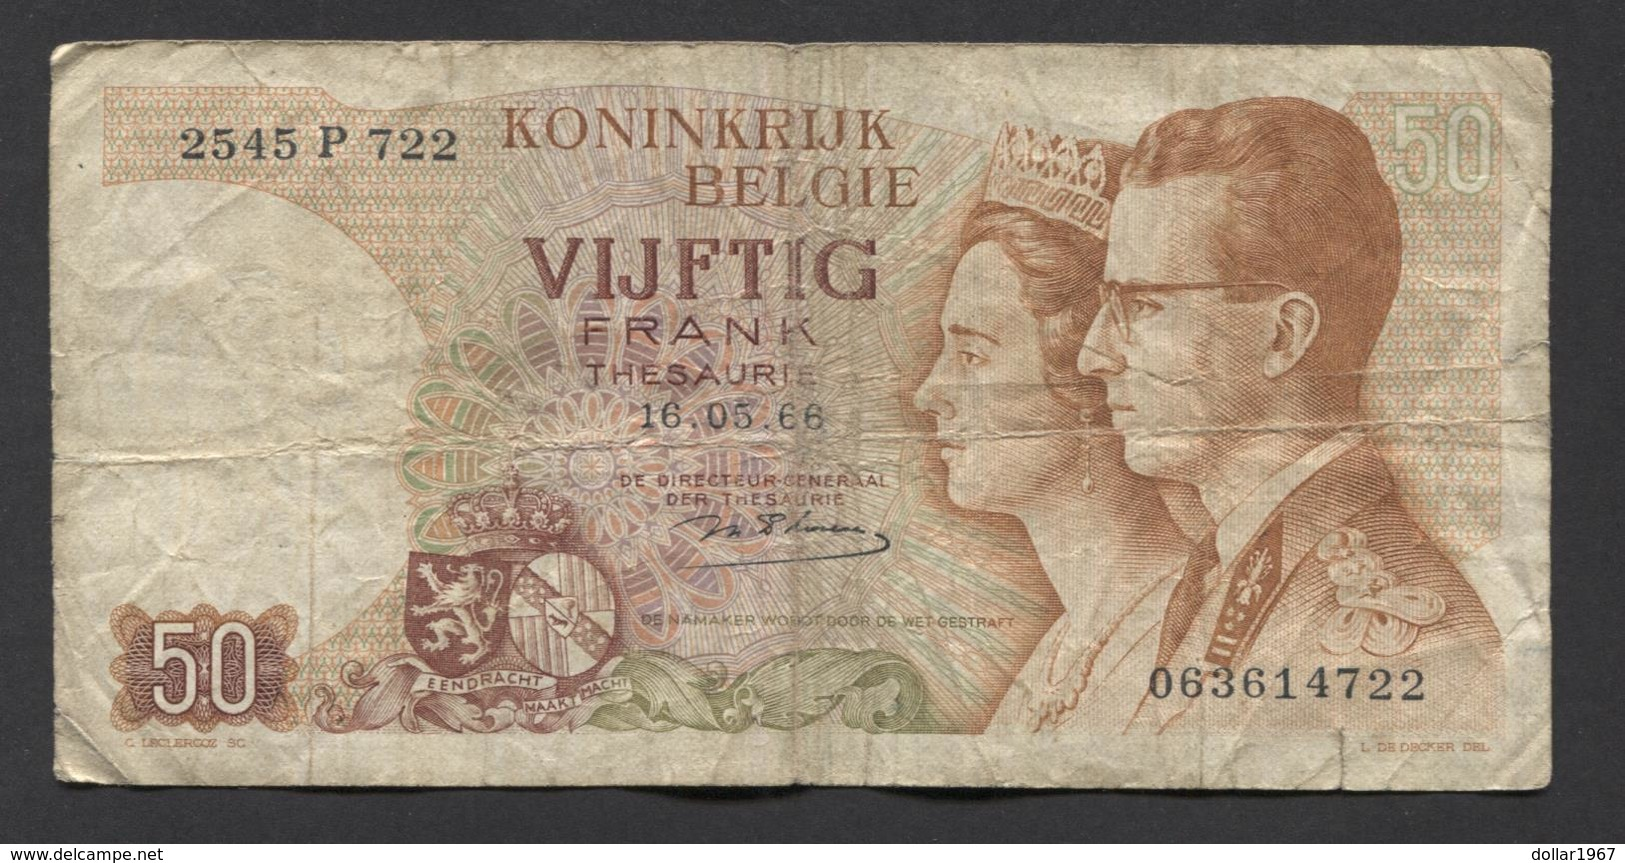 België 50 Frank 14-5- 1966 -NO: 2545 P 722 - [ 6] Staatskas